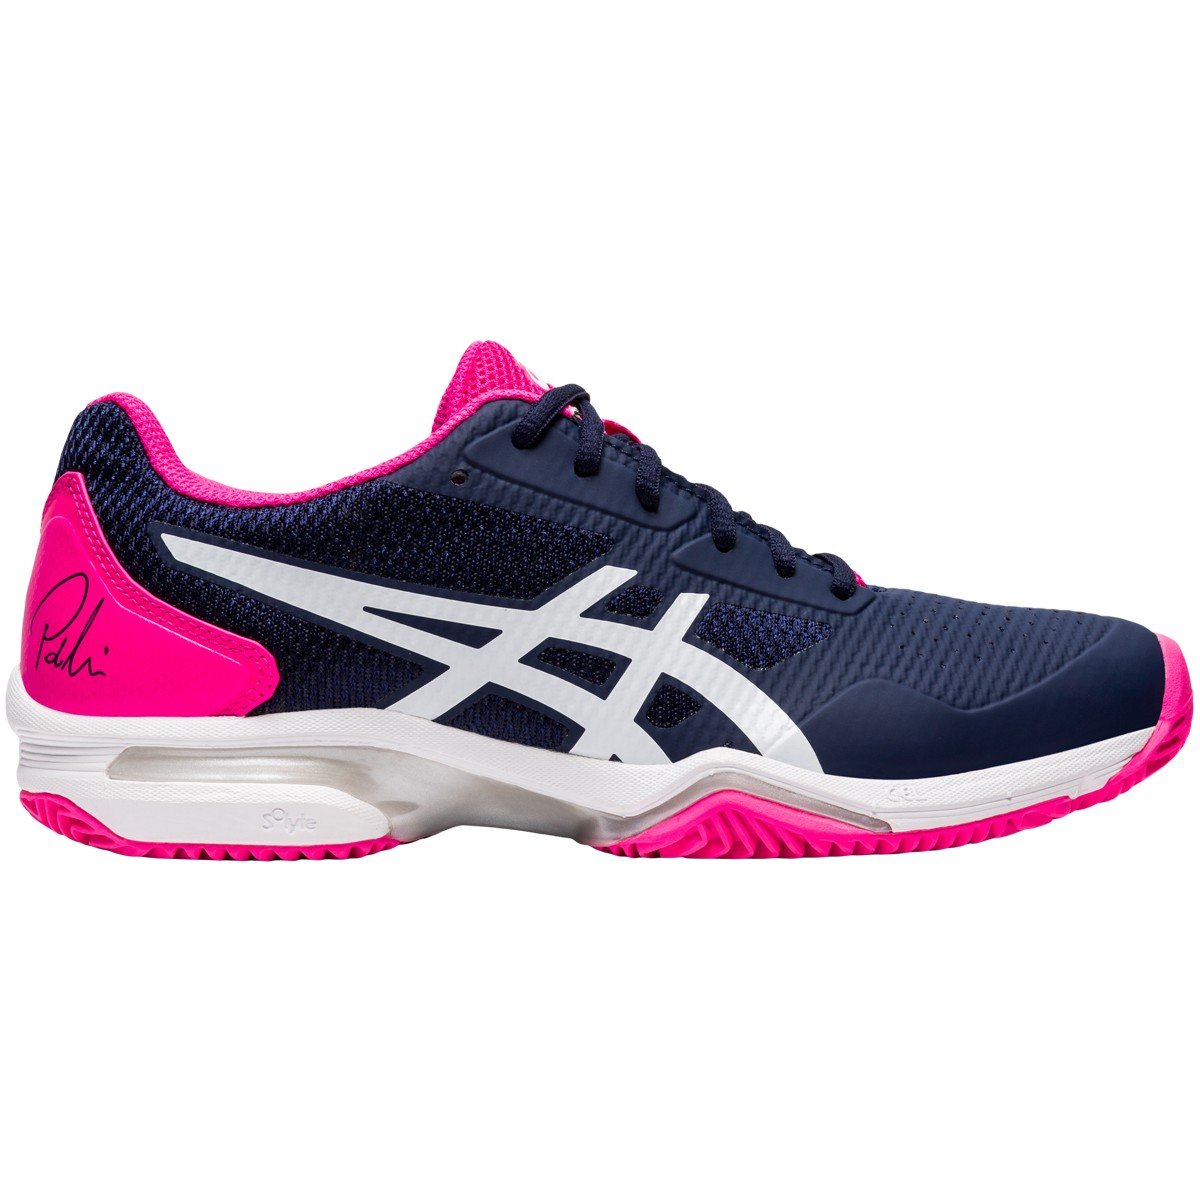 WOMEN'S ASICS GEL LIMA 2 PADEL SHOES - ASICS - Women's - Shoes ...